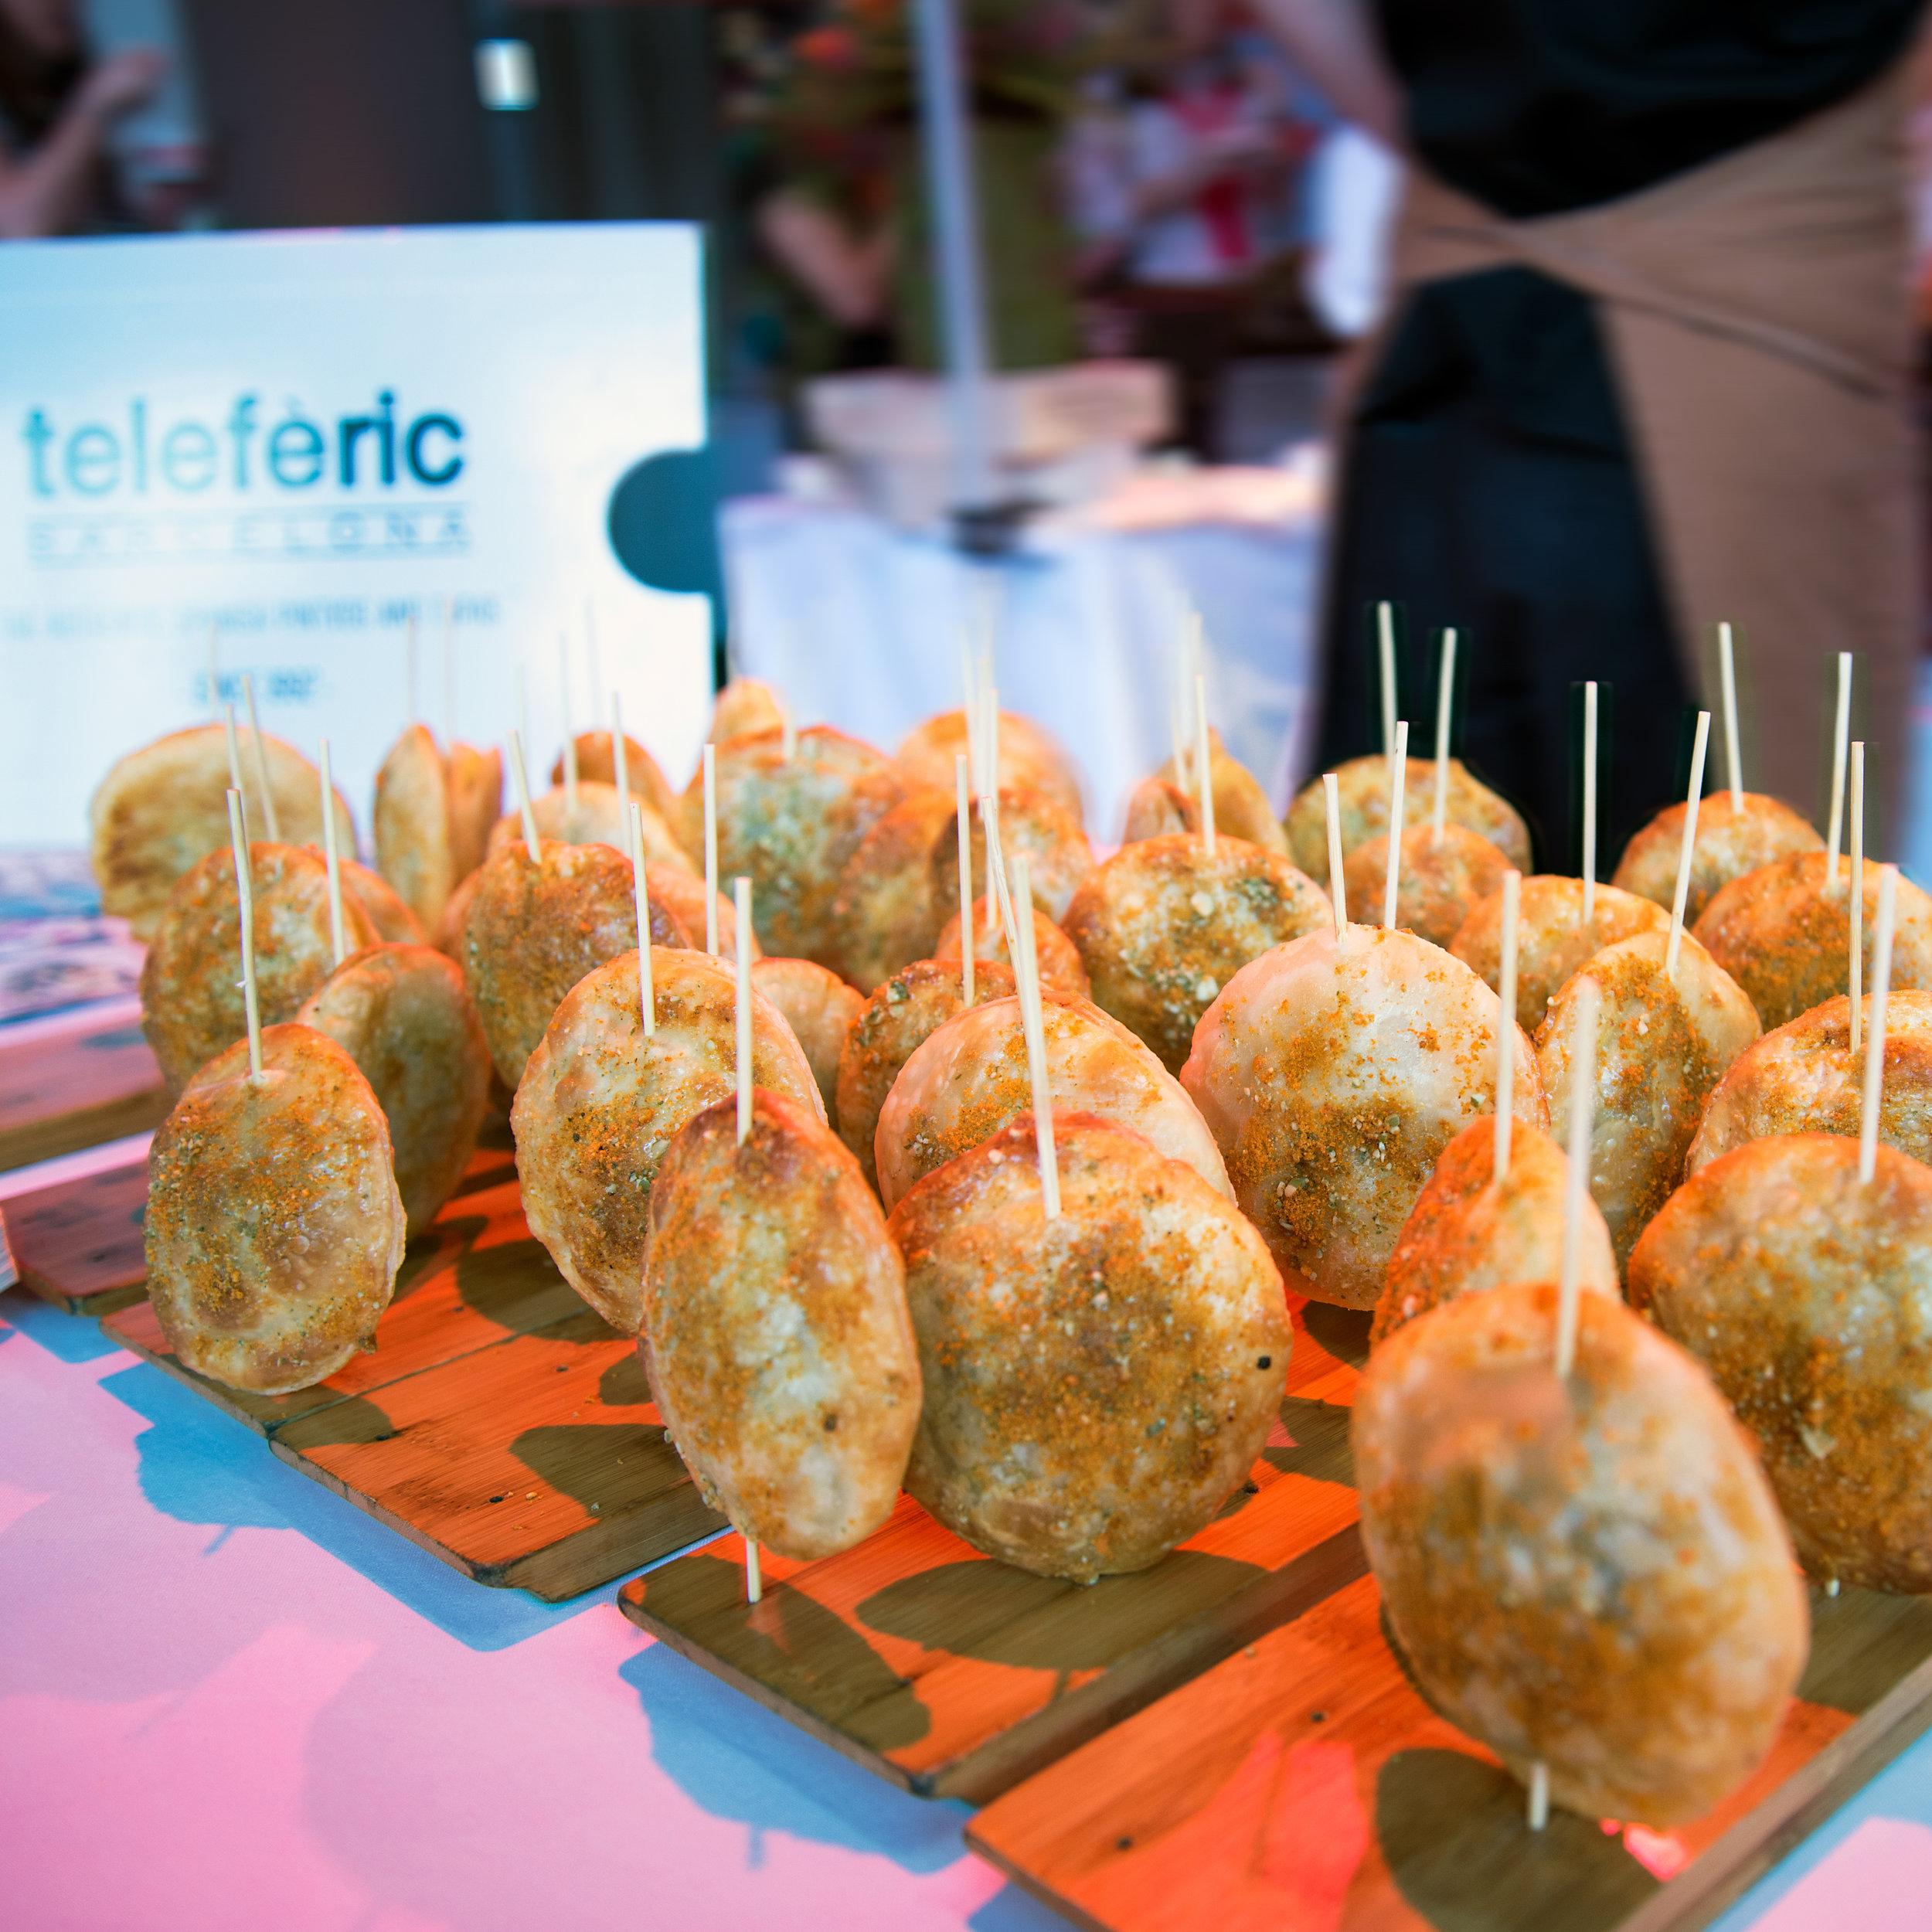 teleferic-barcelona_creamy-foir-grass-truffle-empanada_01.jpg